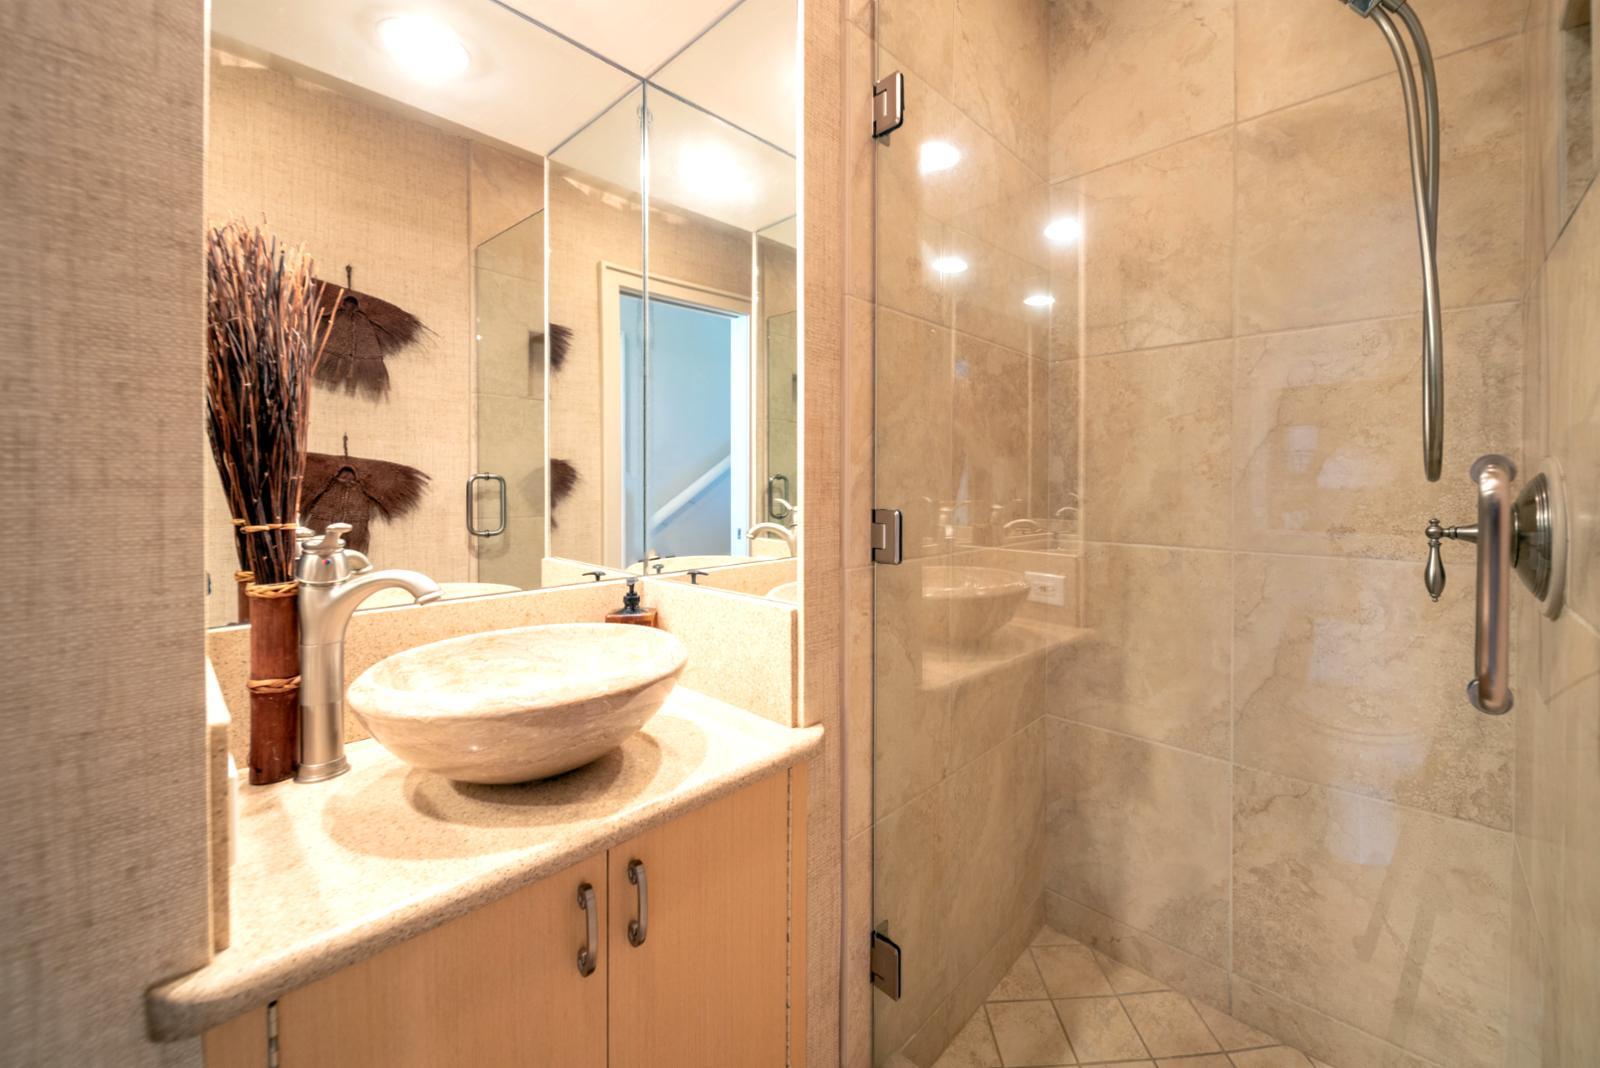 Custom guest bath finishings with upgraded lighting